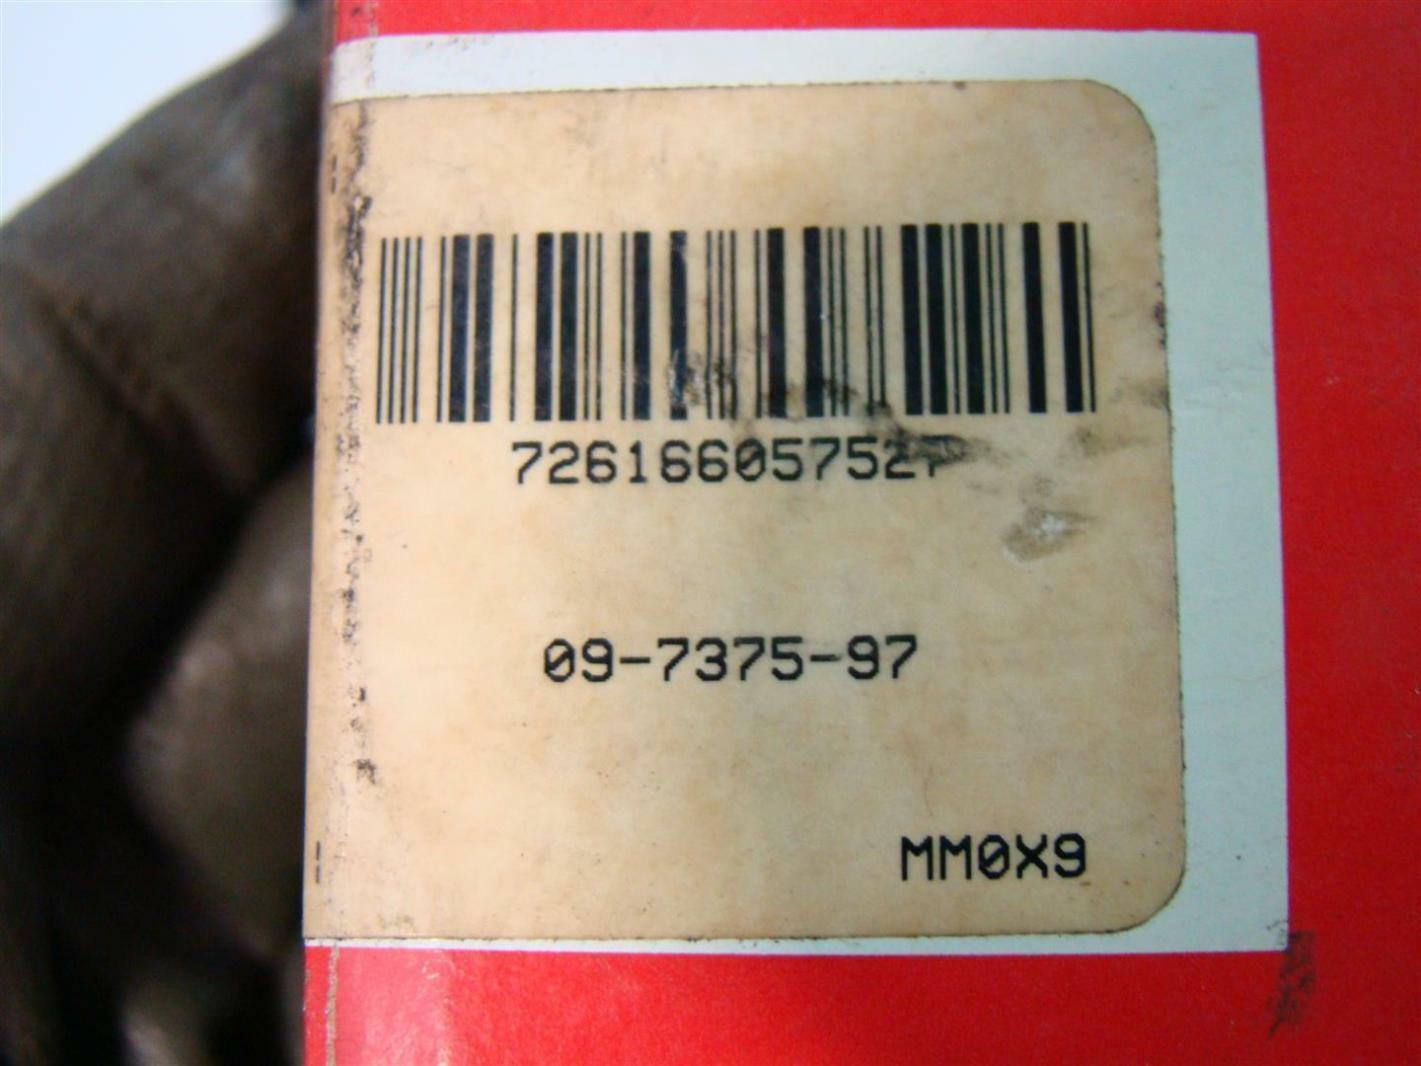 McGill Pecision Bearing Cam Yoke Roller 09-7375-97 CYR 2 S